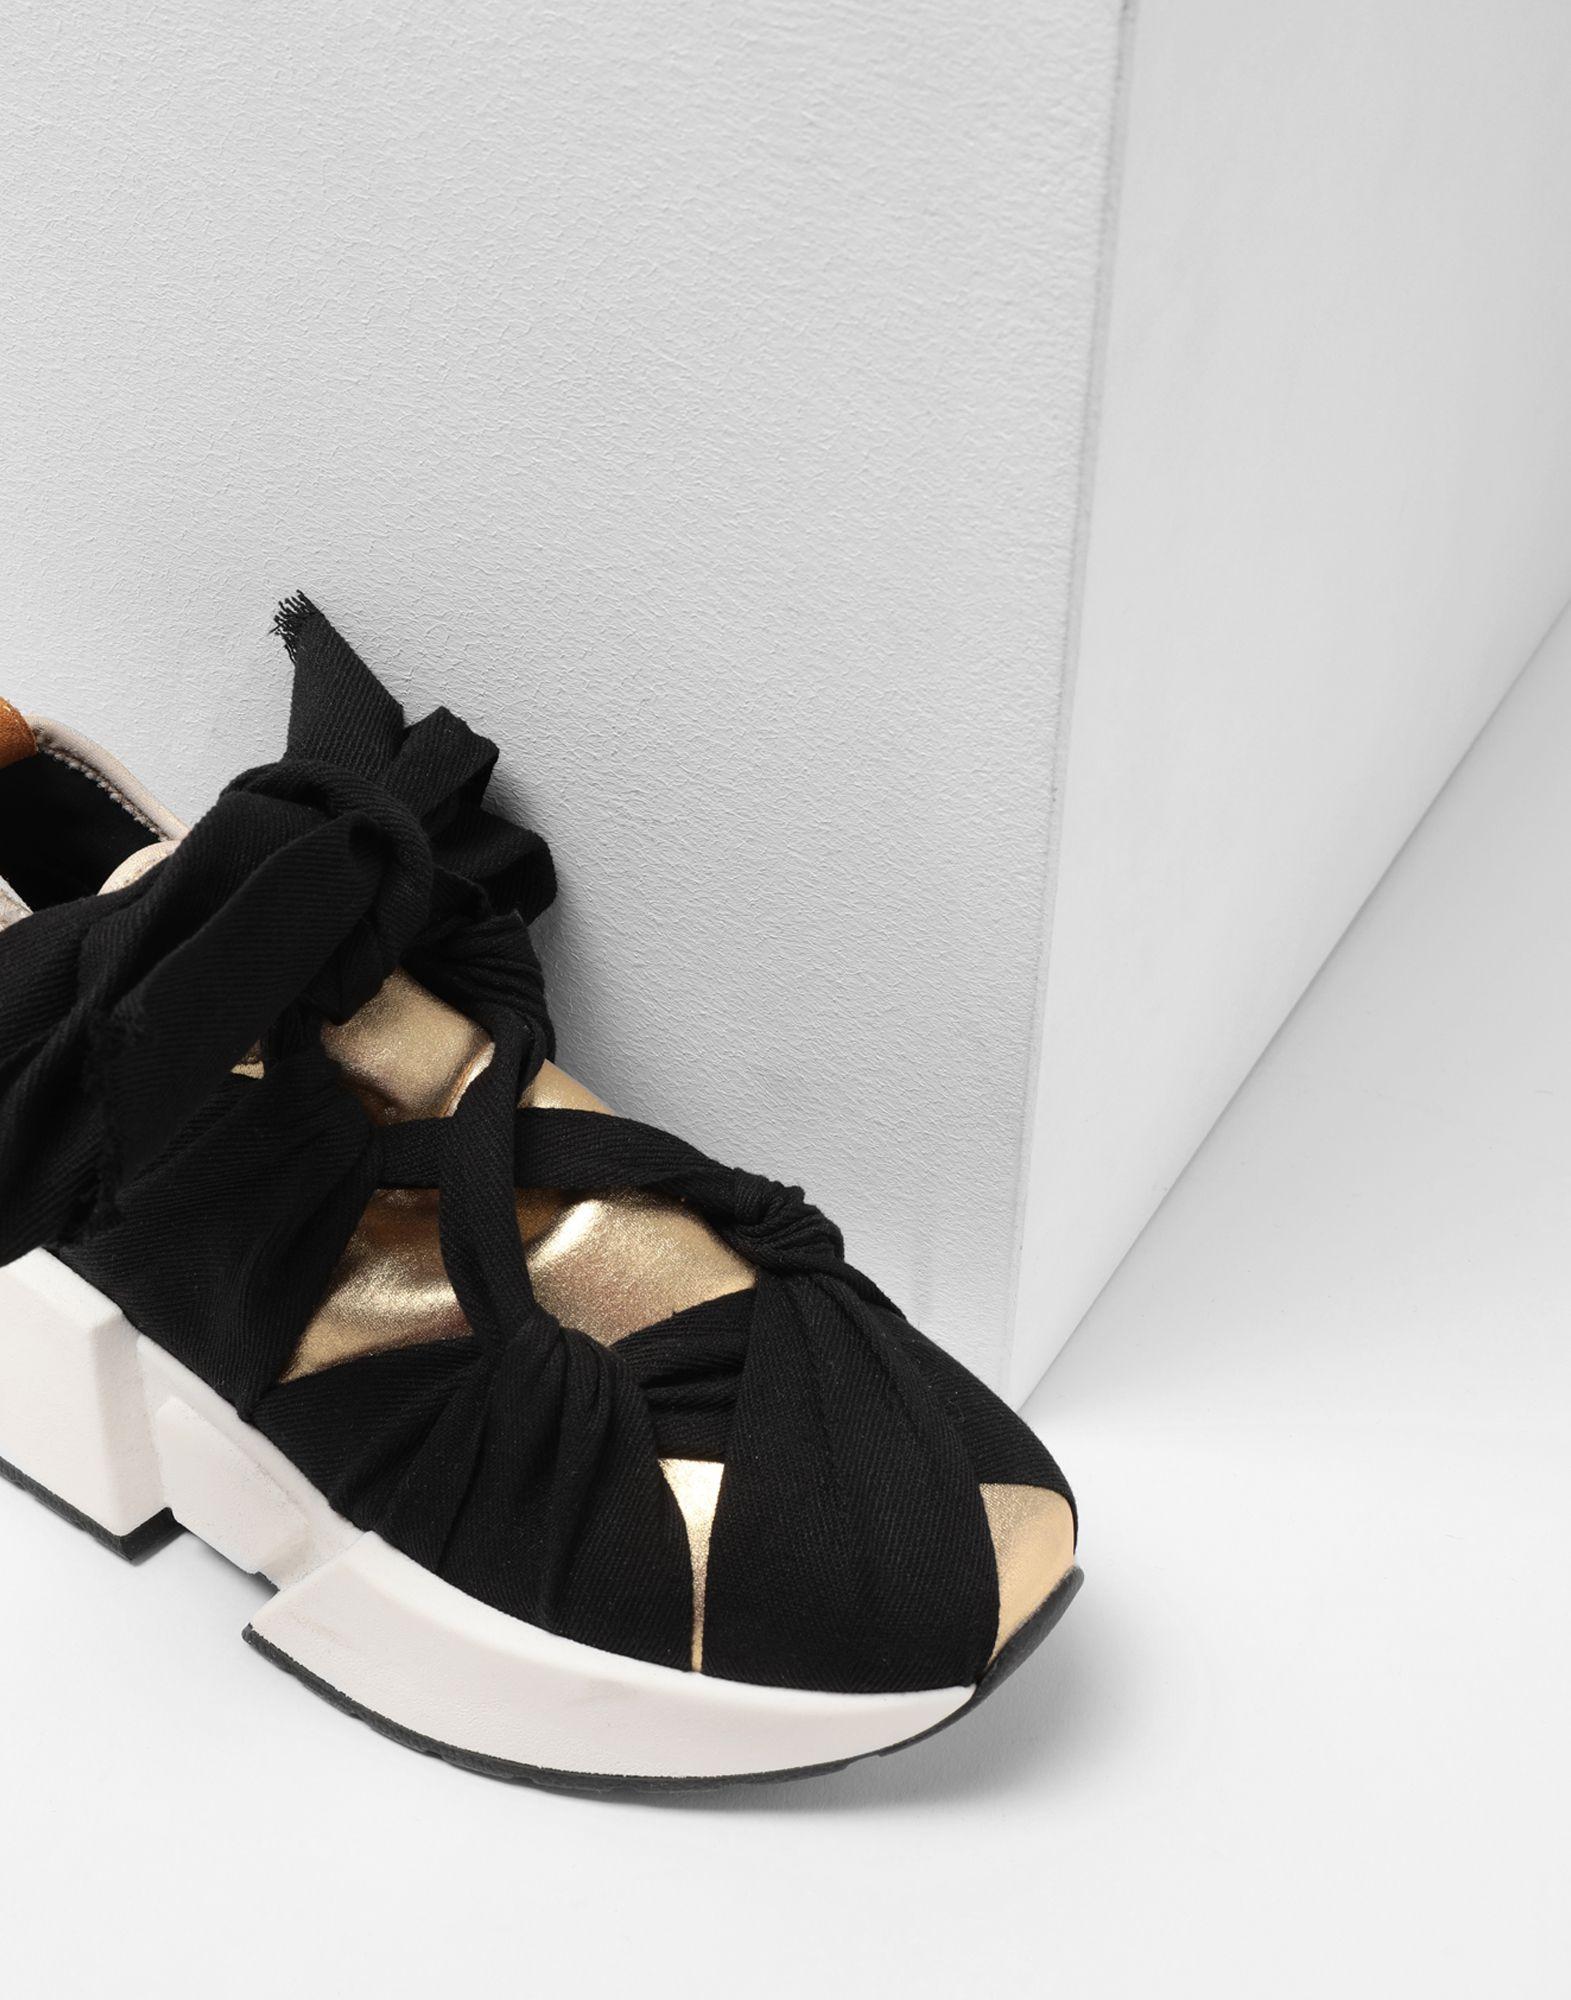 MM6 MAISON MARGIELA Ribbon tie leather sneakers Sneakers Woman a